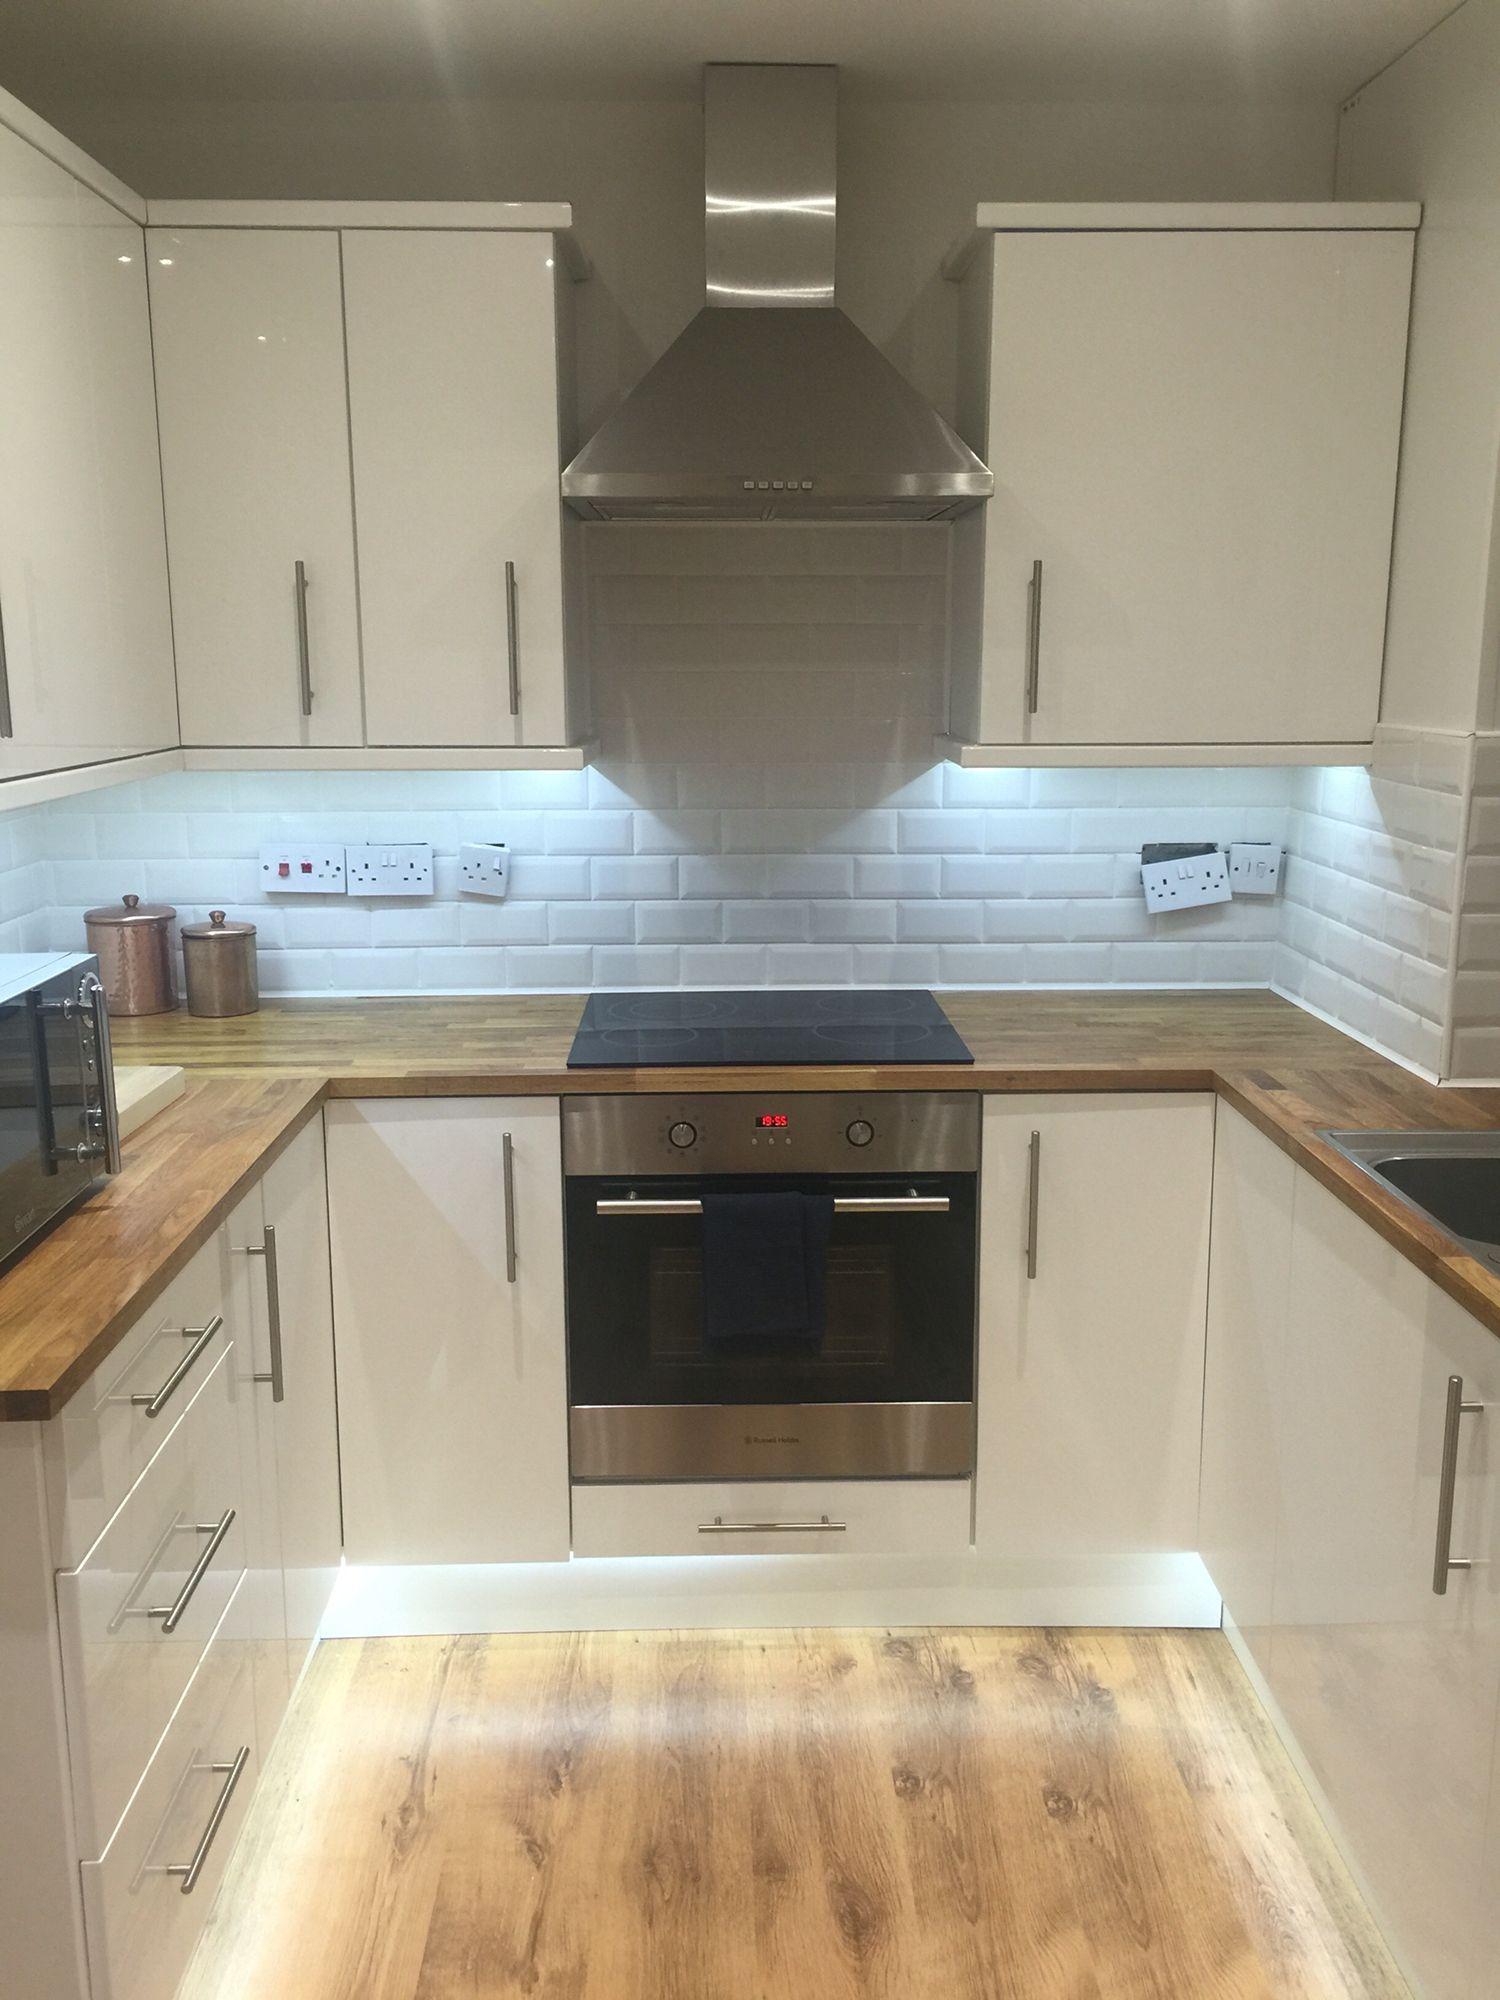 B Q Kitchens Design Appointment   DECORKEUN